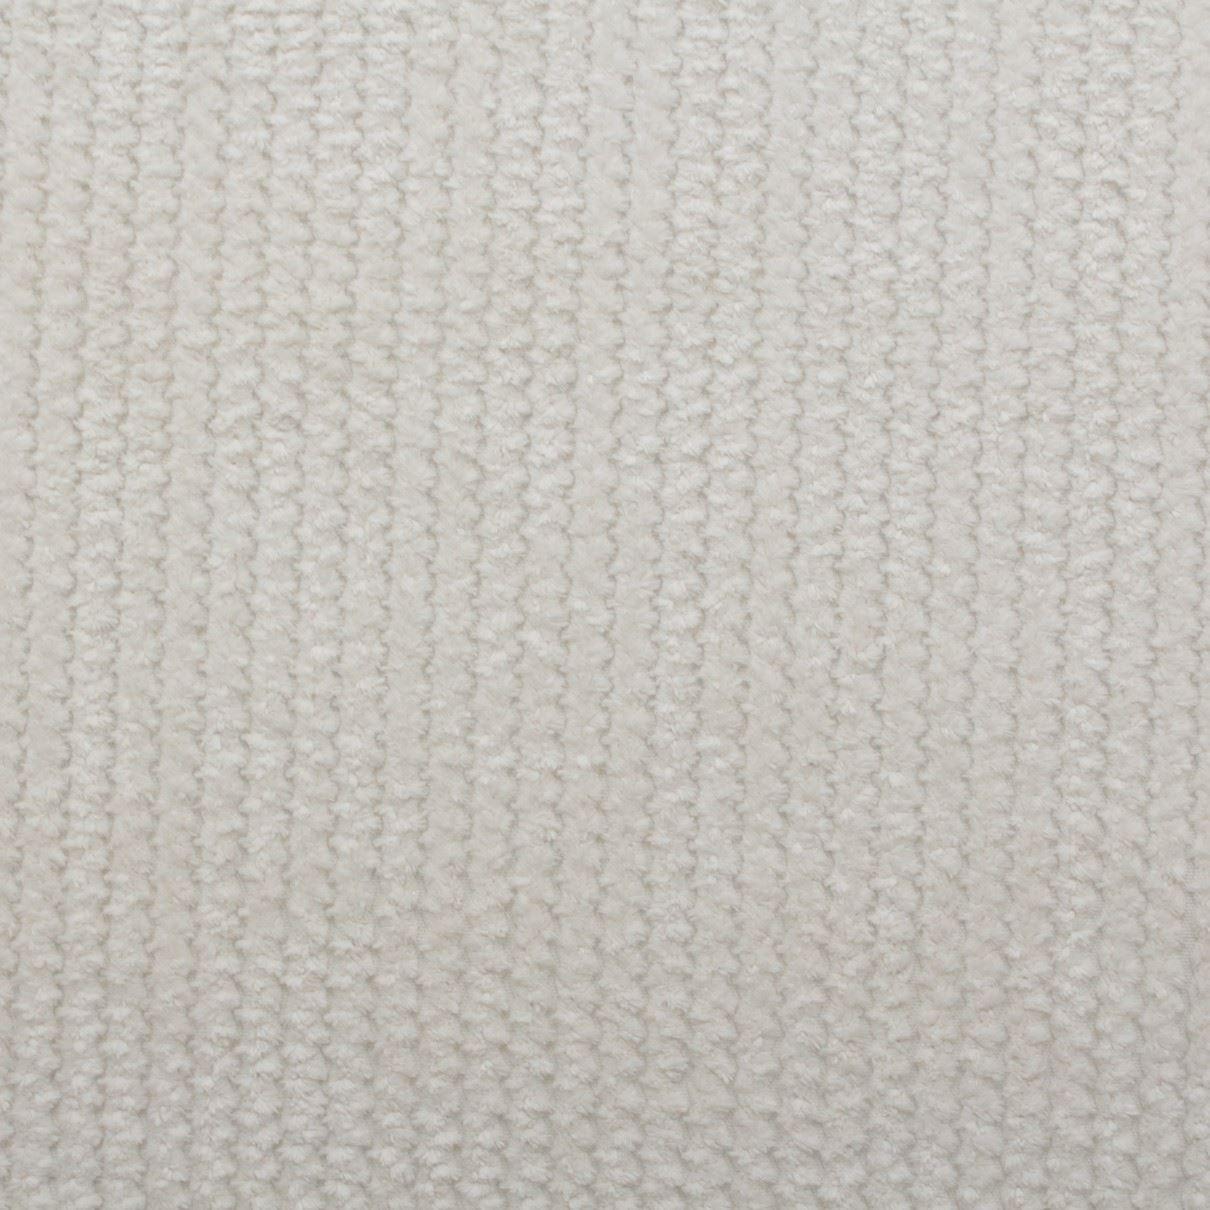 White Sofa Fabric Free Shipping White Sofa Fabric French